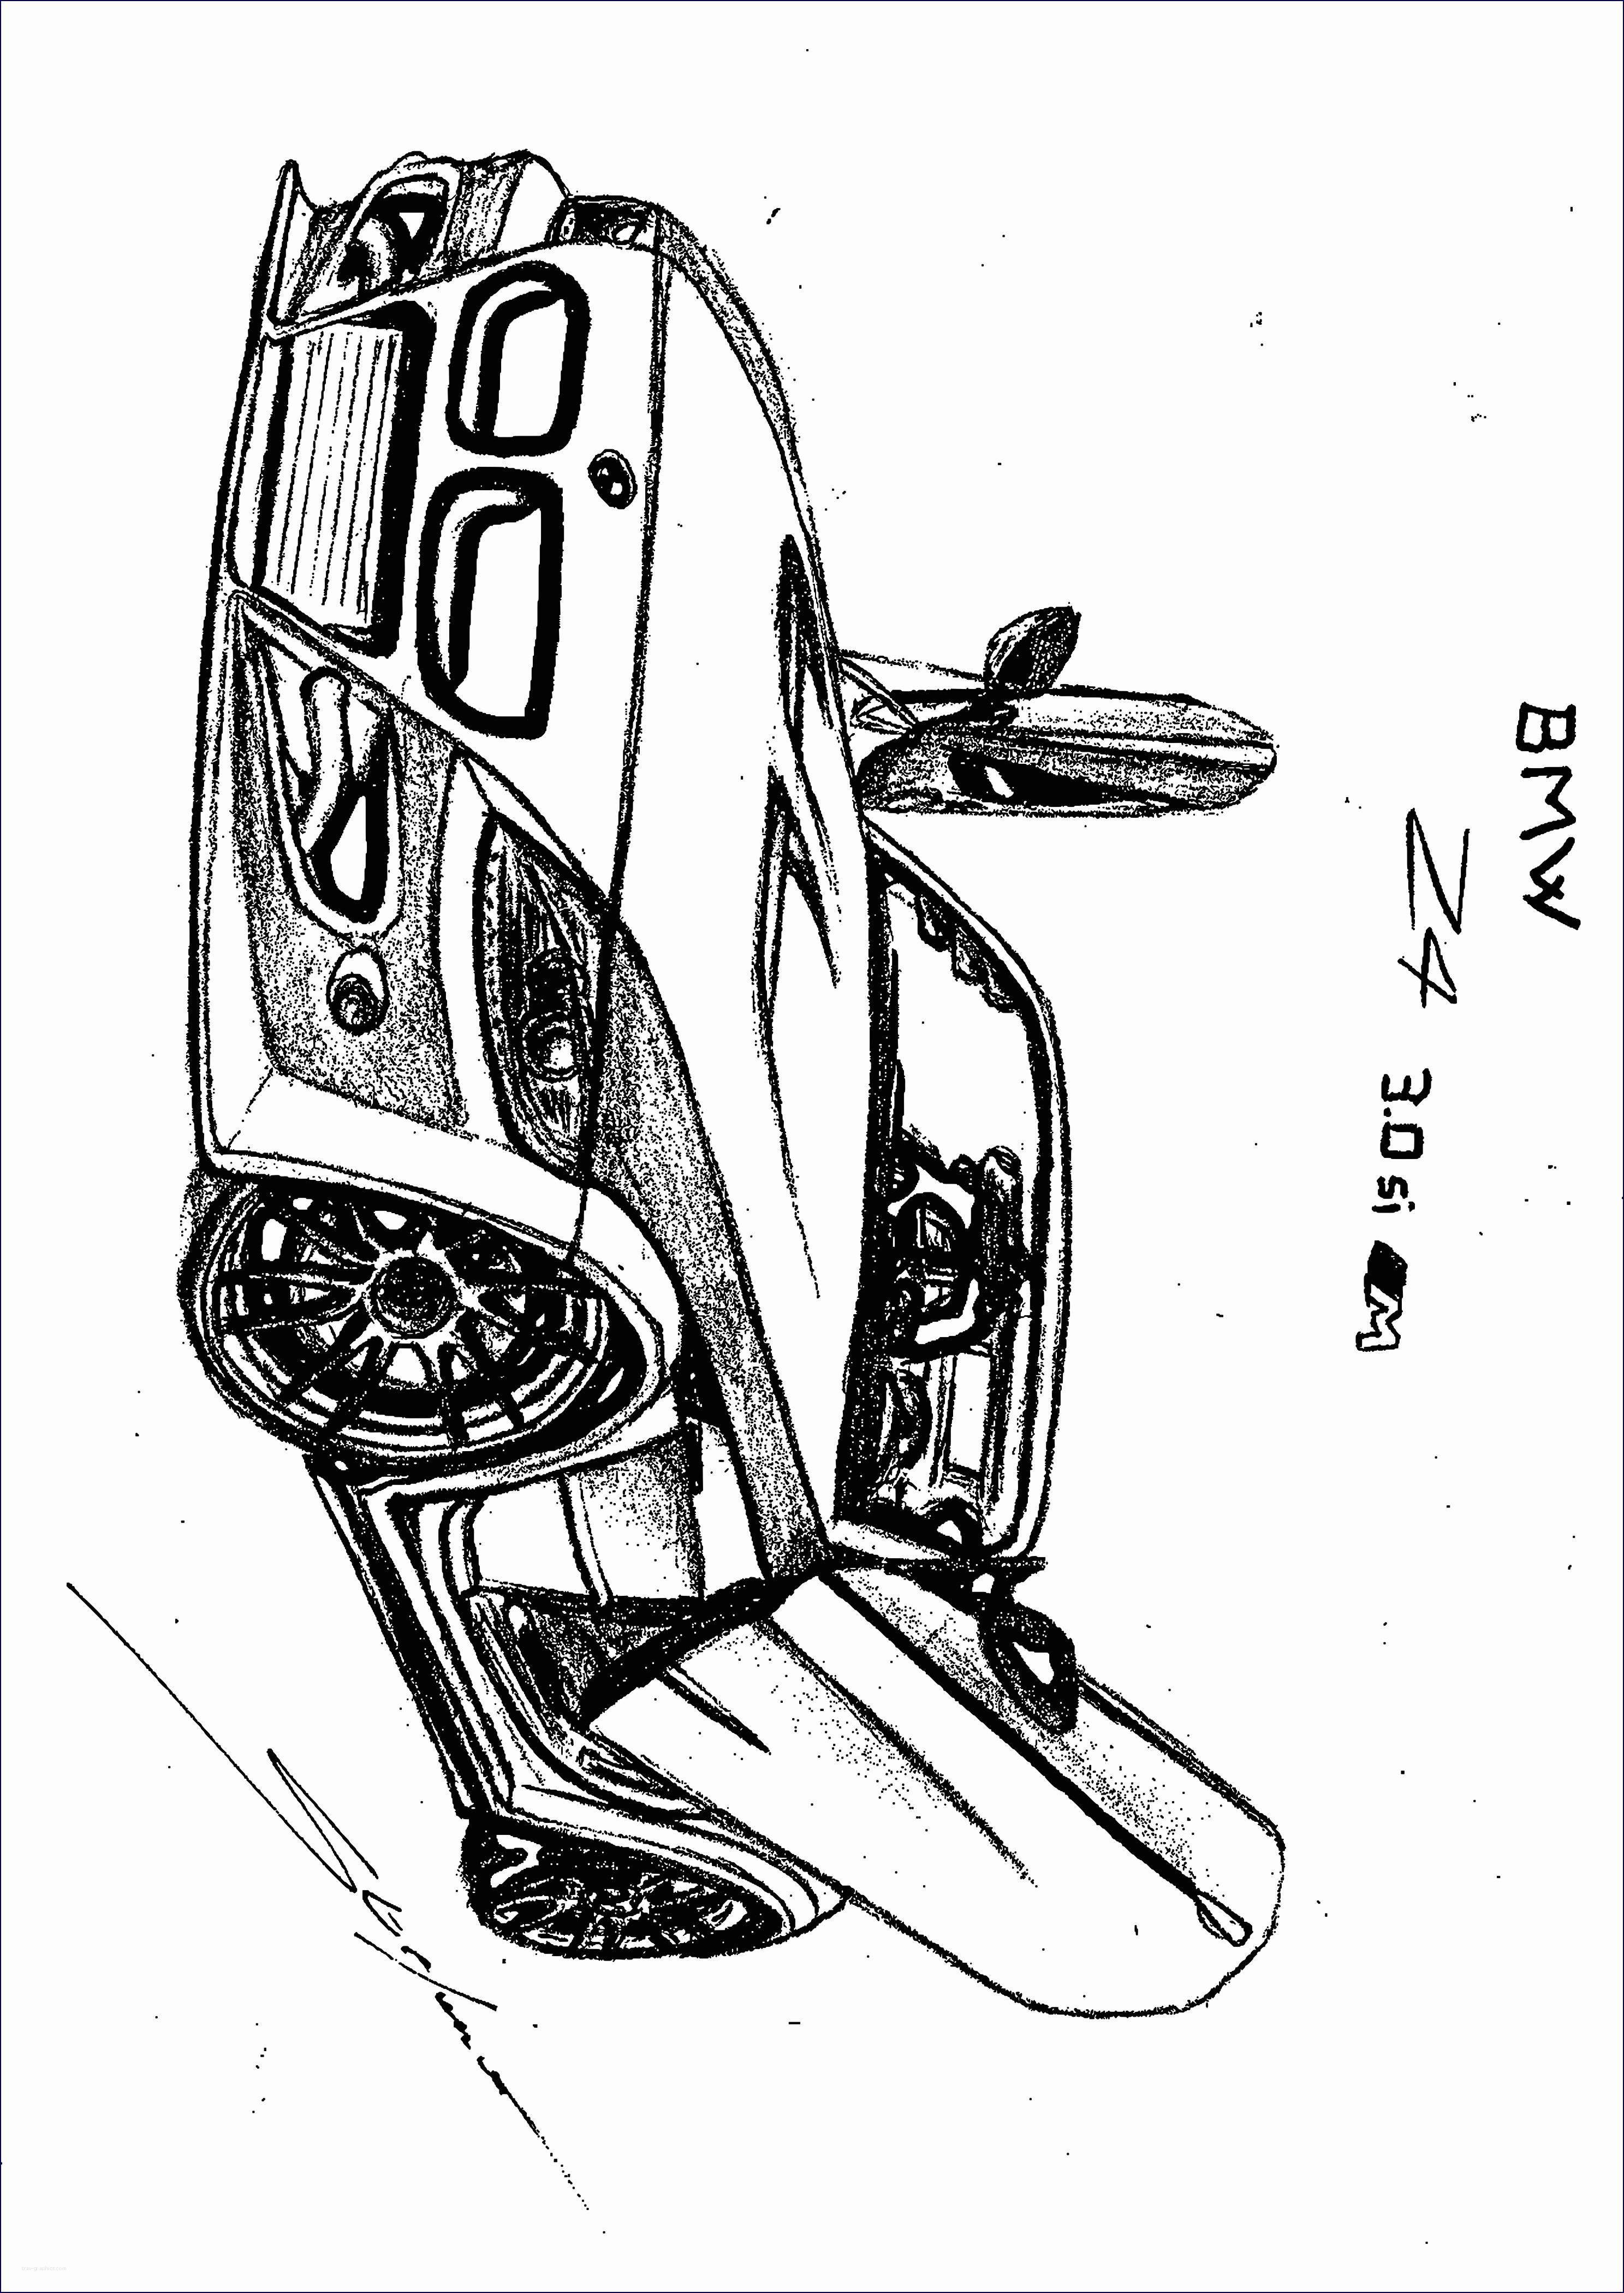 Ausmalbilder Wm 2018 Neu Ausmalbilder Ford Mustang 15